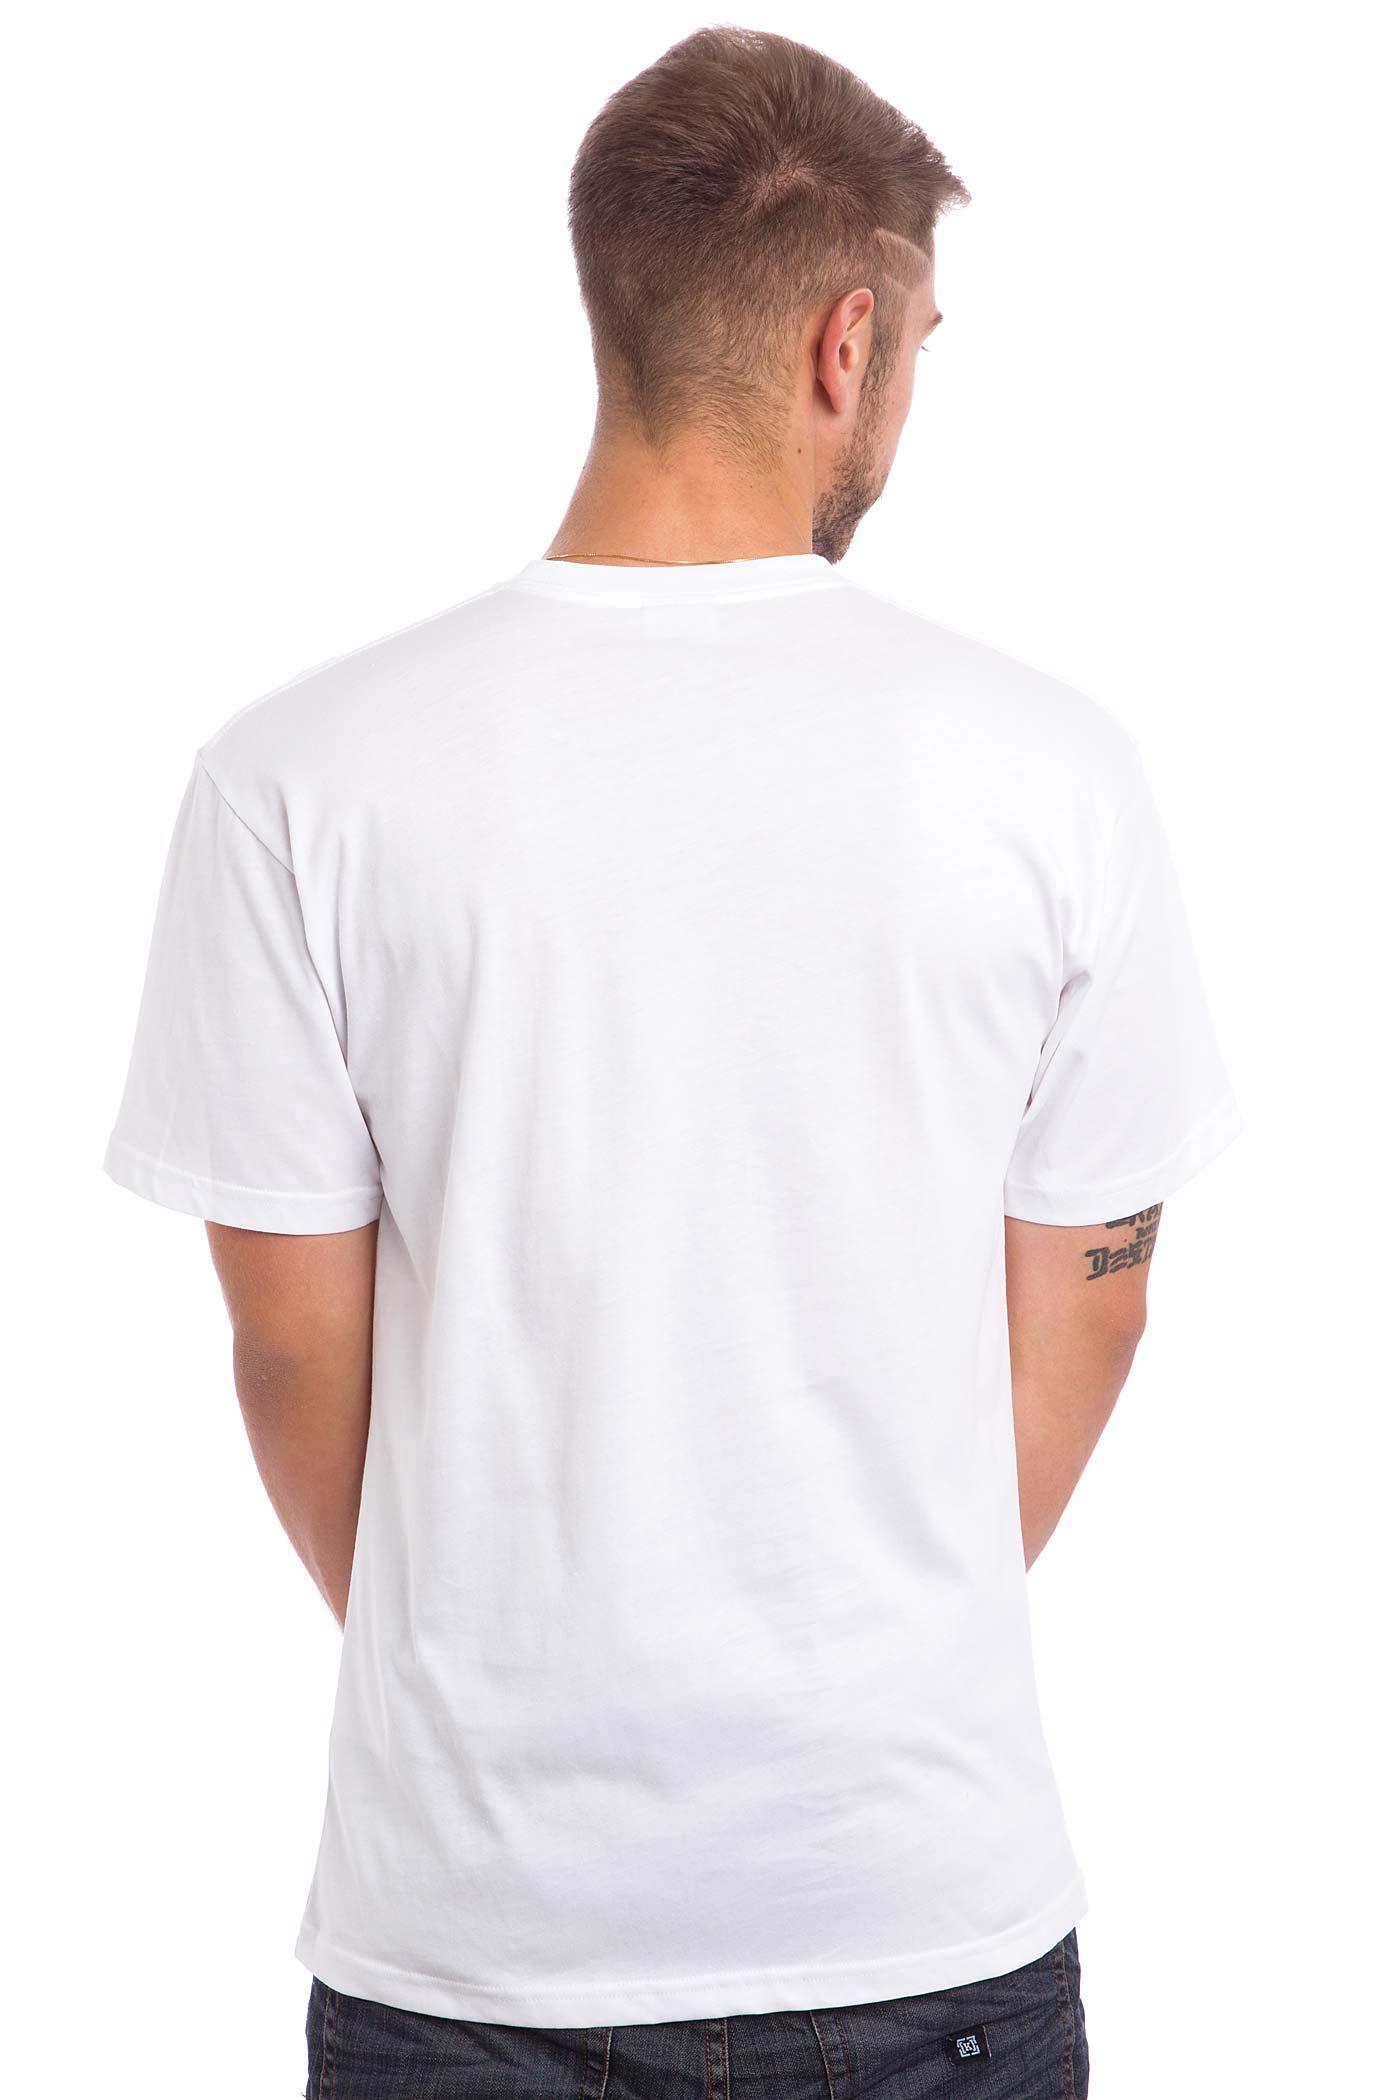 more vans t shirts 34 more t shirts 840 vans brand shop 458 t shirts. Black Bedroom Furniture Sets. Home Design Ideas